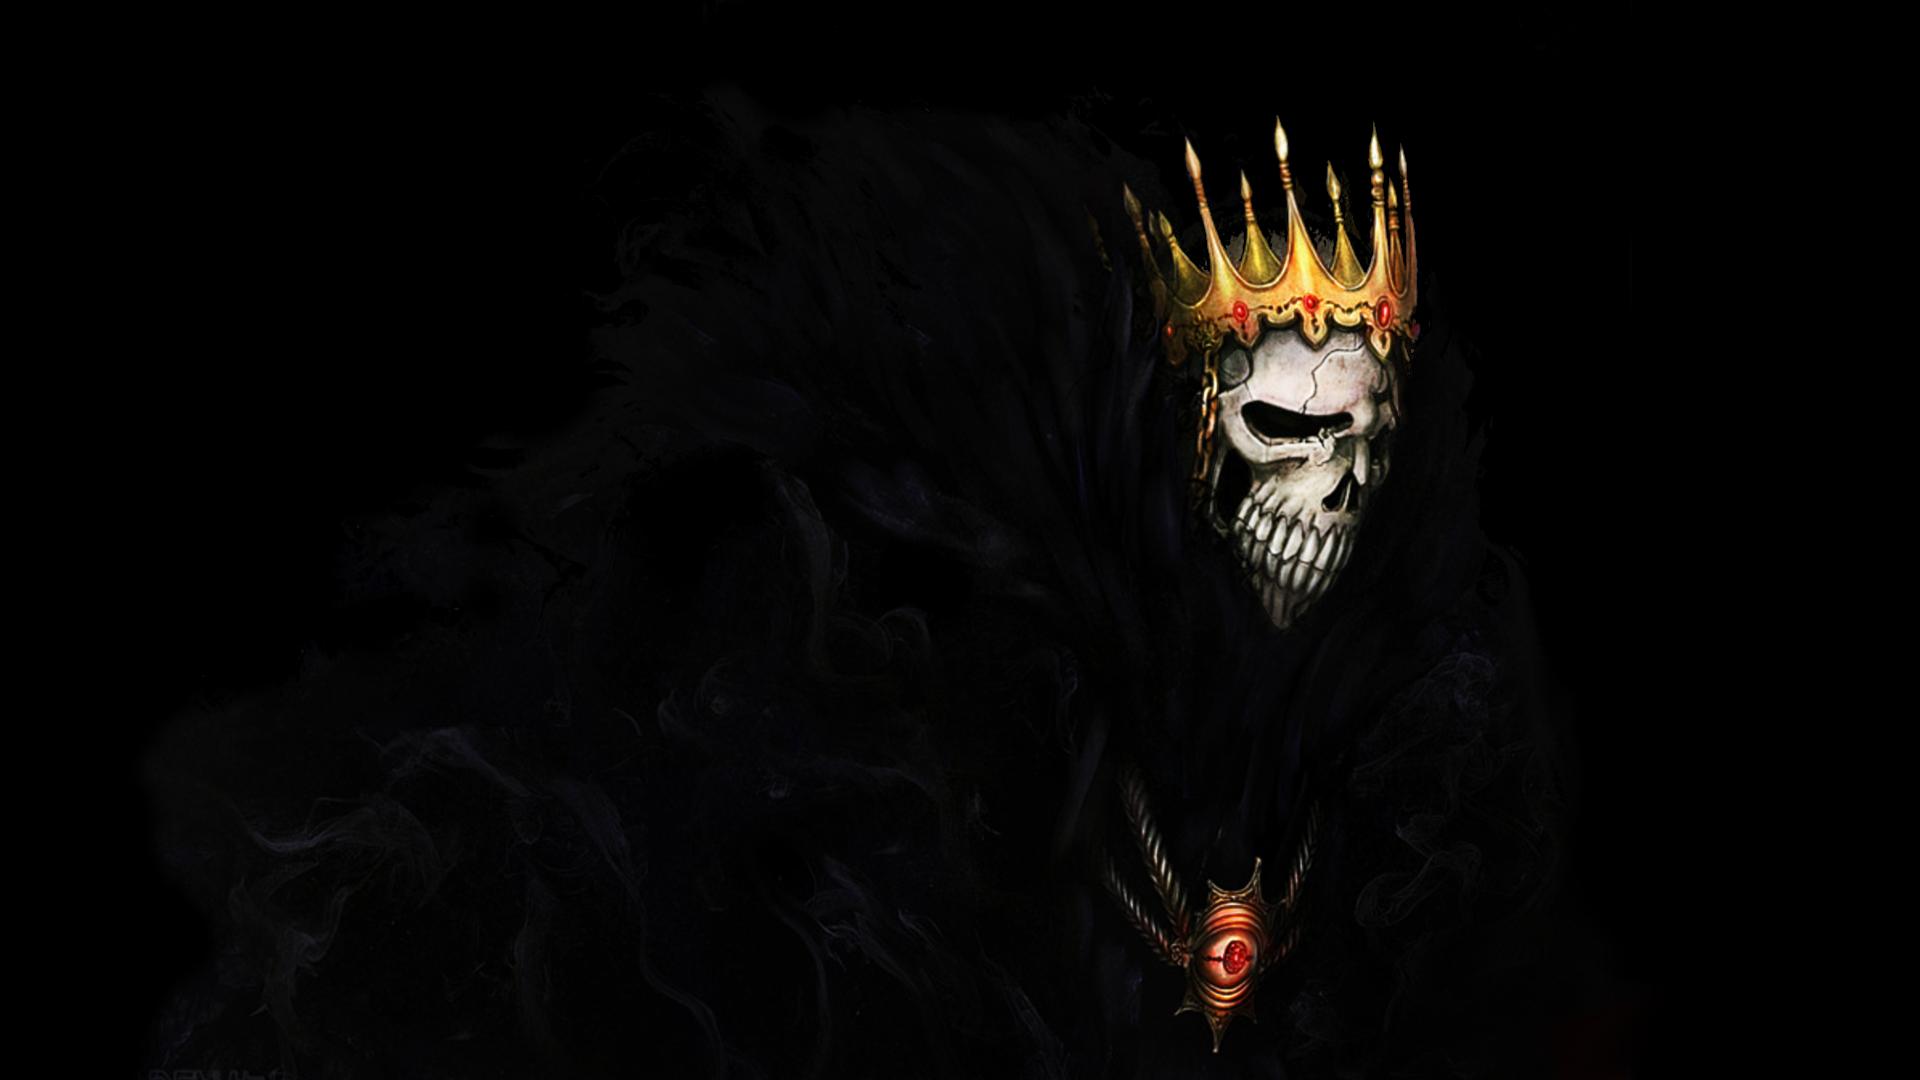 Anime 1920x1080 Bleach death Barragan Luisenbarn skull Espada